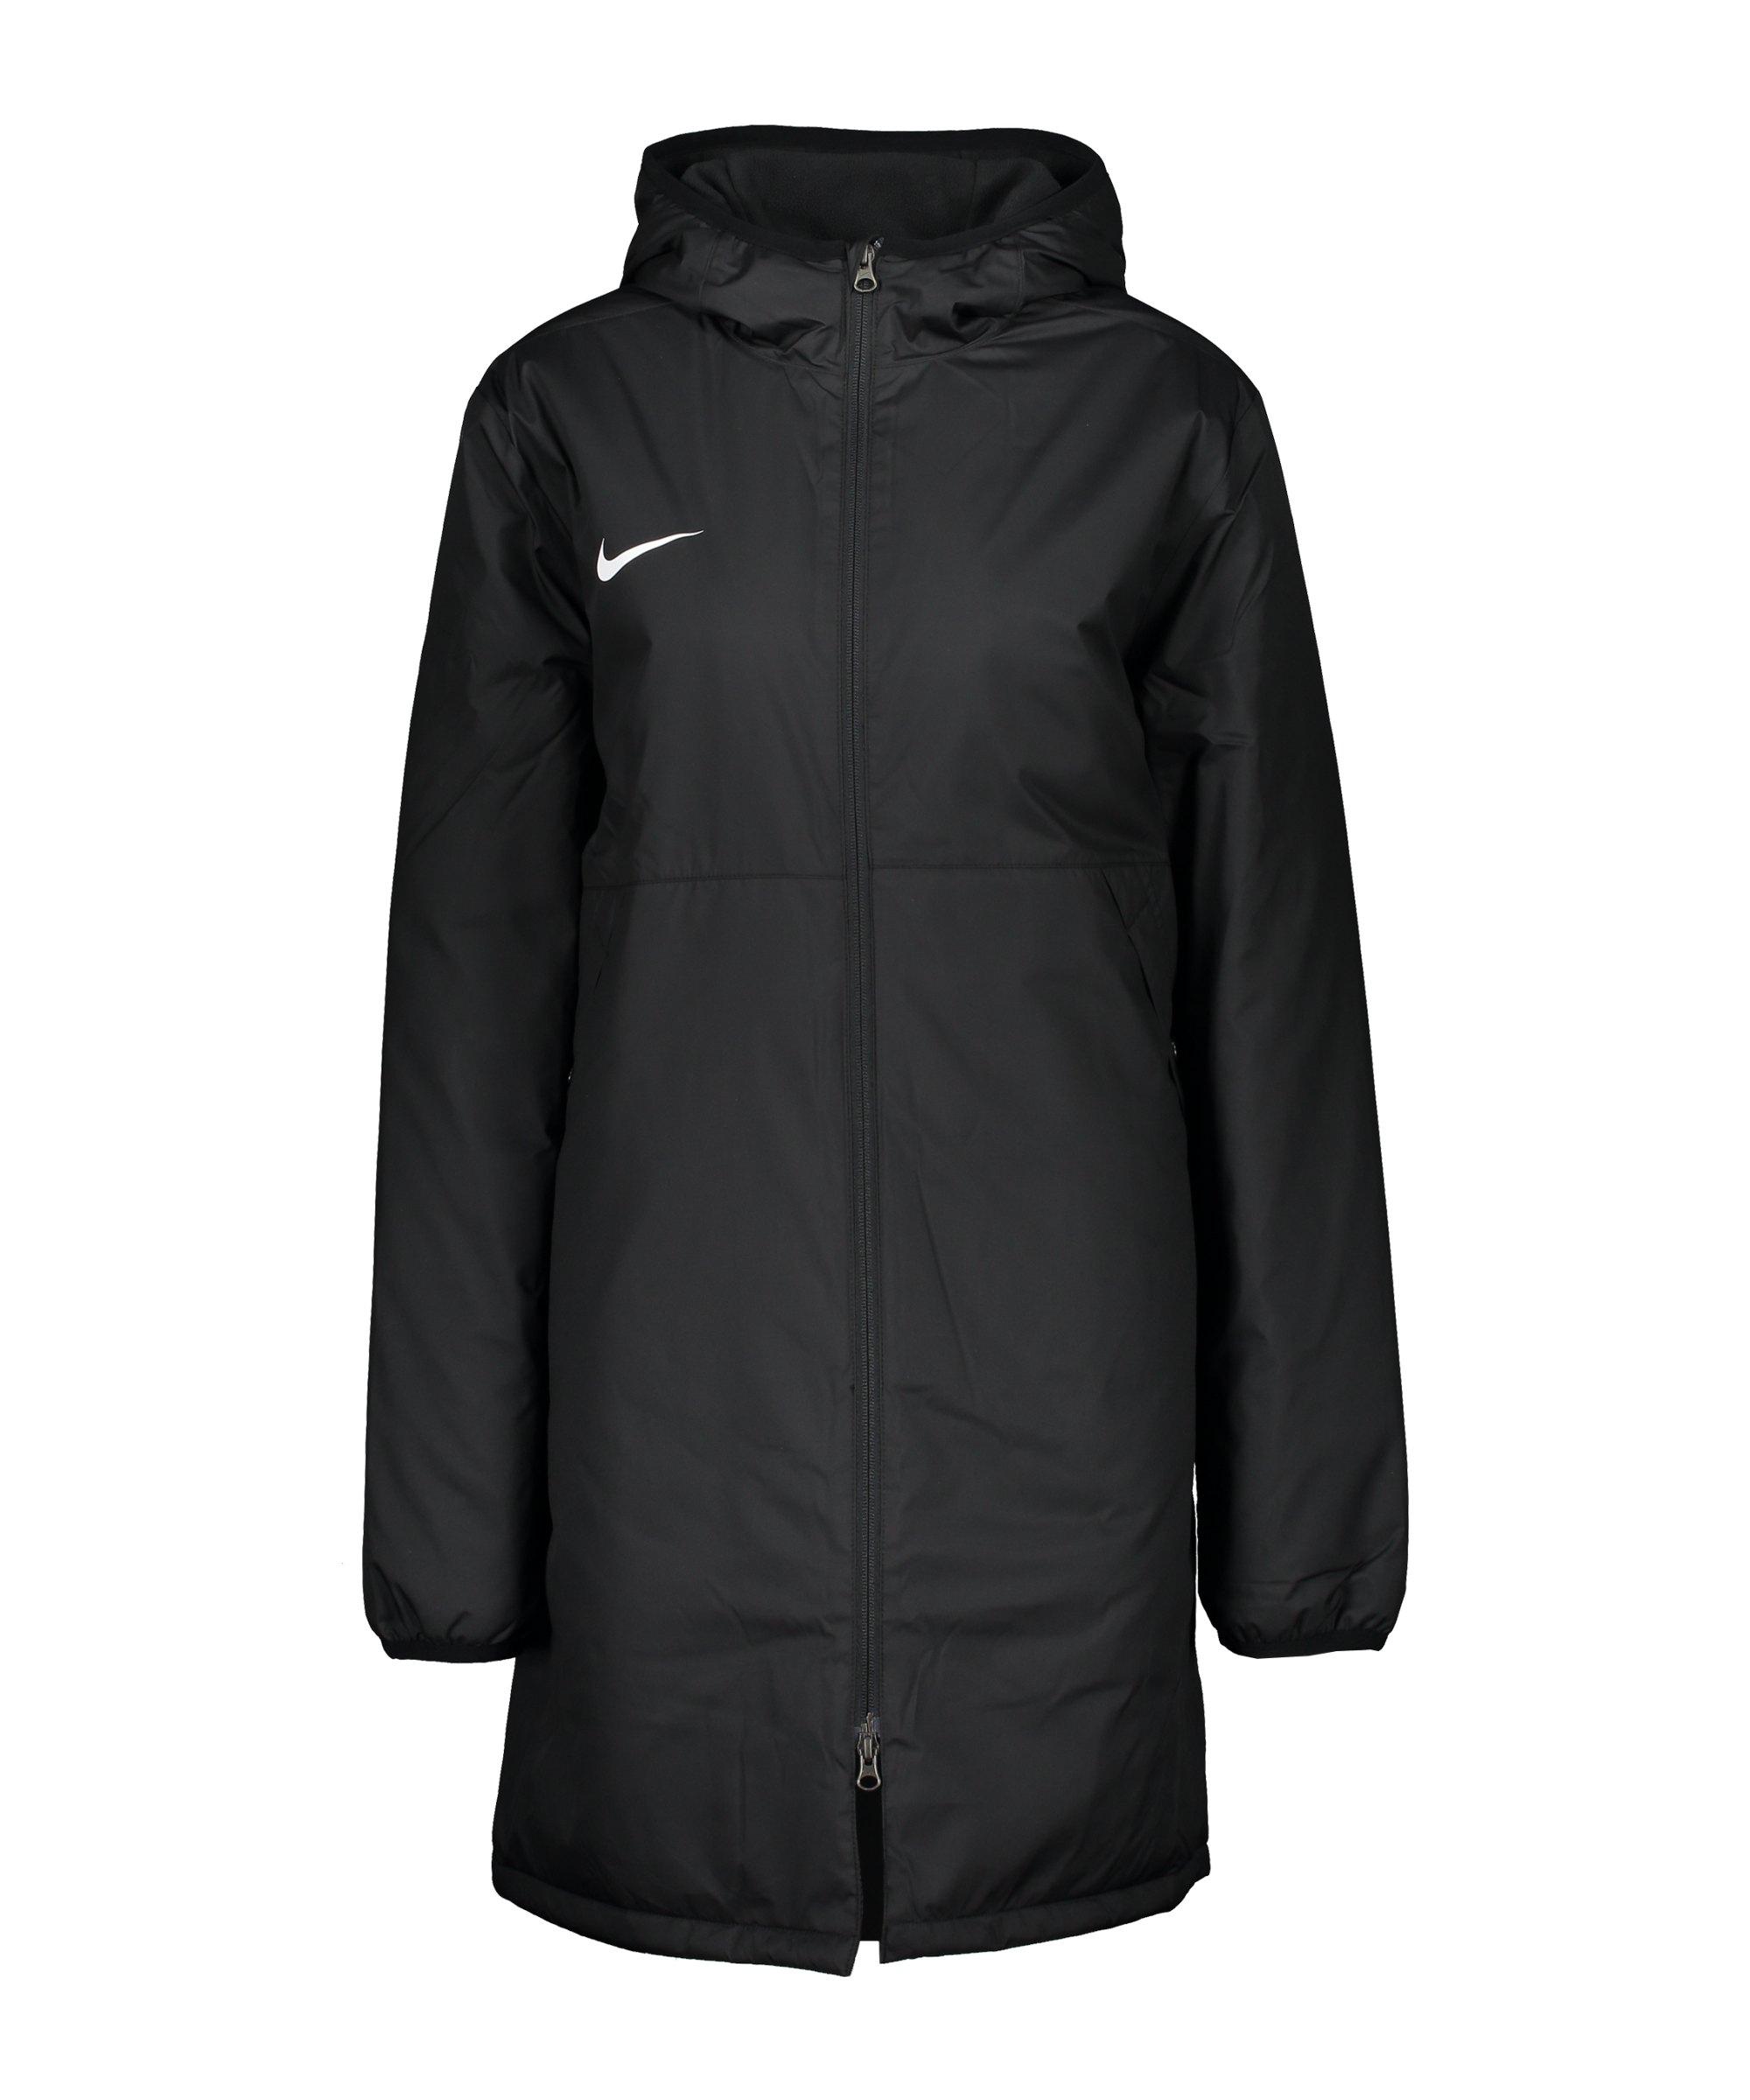 Nike Park 20 Winterjacke Damen Schwarz F010 - schwarz